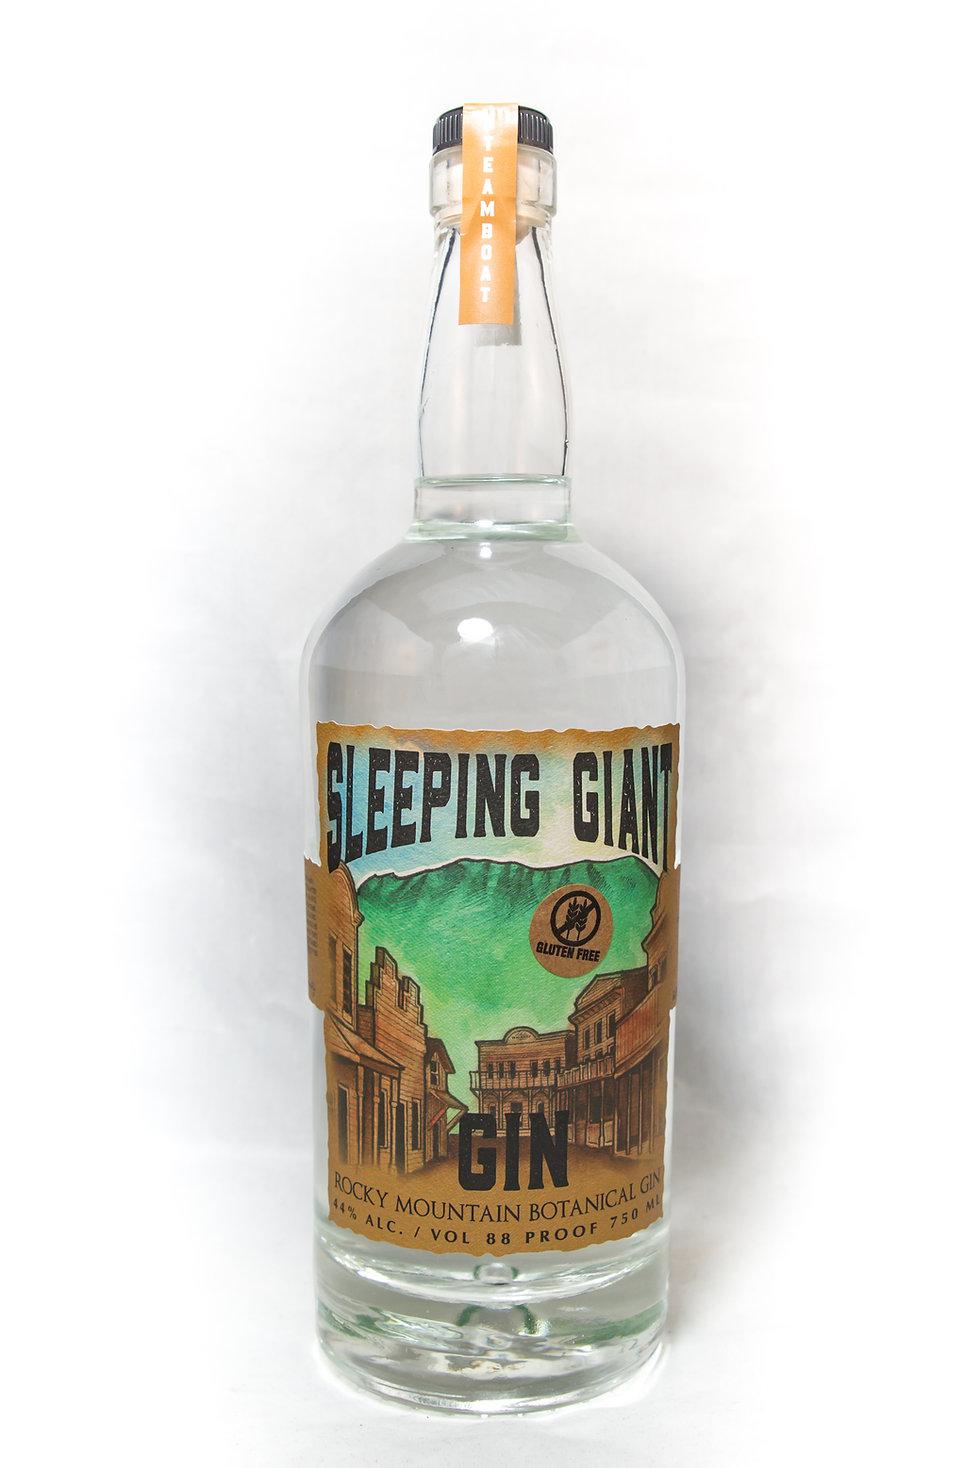 Steamboat Whiskey Company's Sleeping Giant Gin